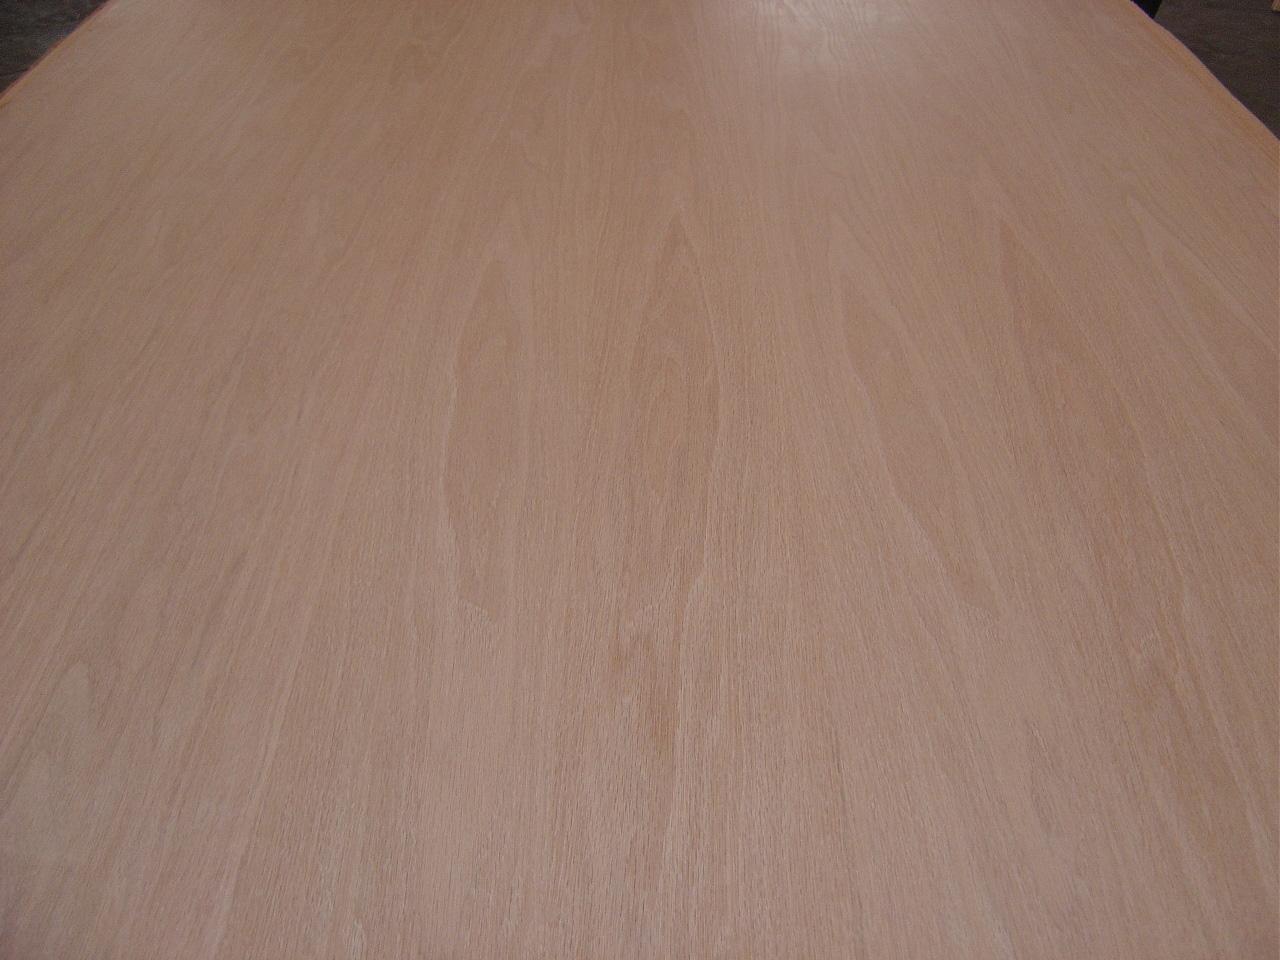 Hpl - linyi consmos wood industry